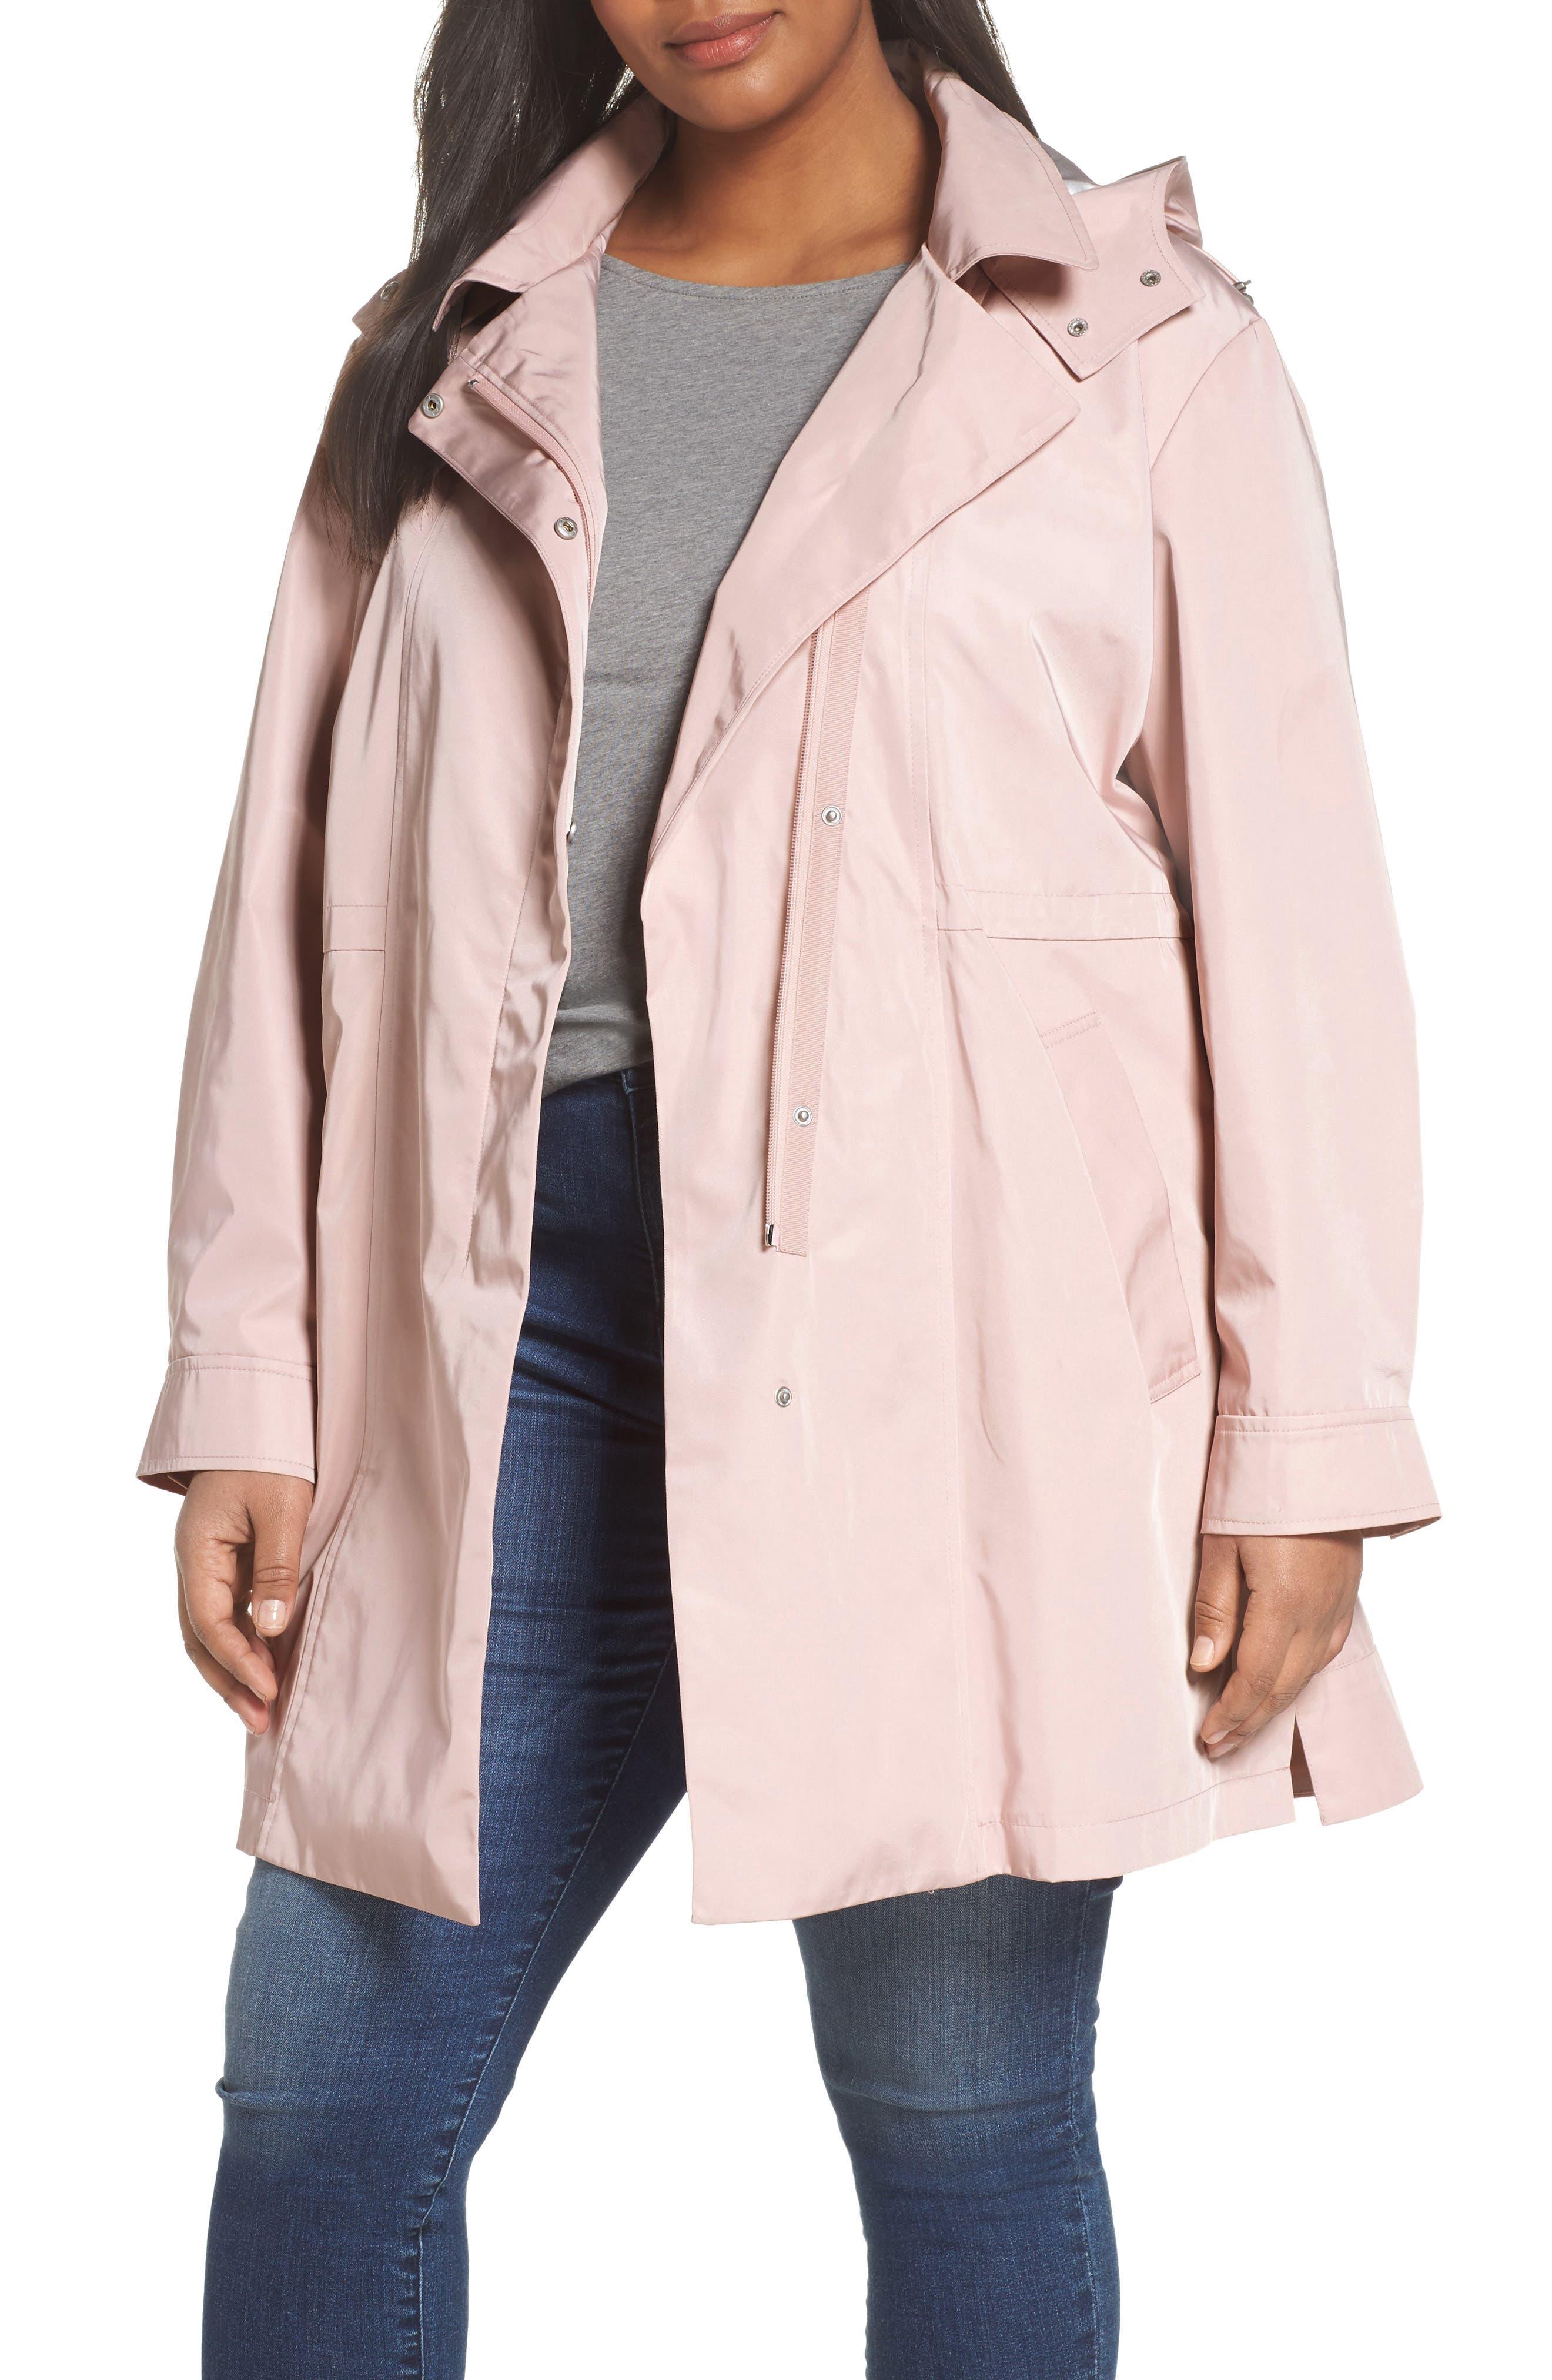 Main Image - Kristen Blake Tech Hooded Trench Coat (Plus Size)